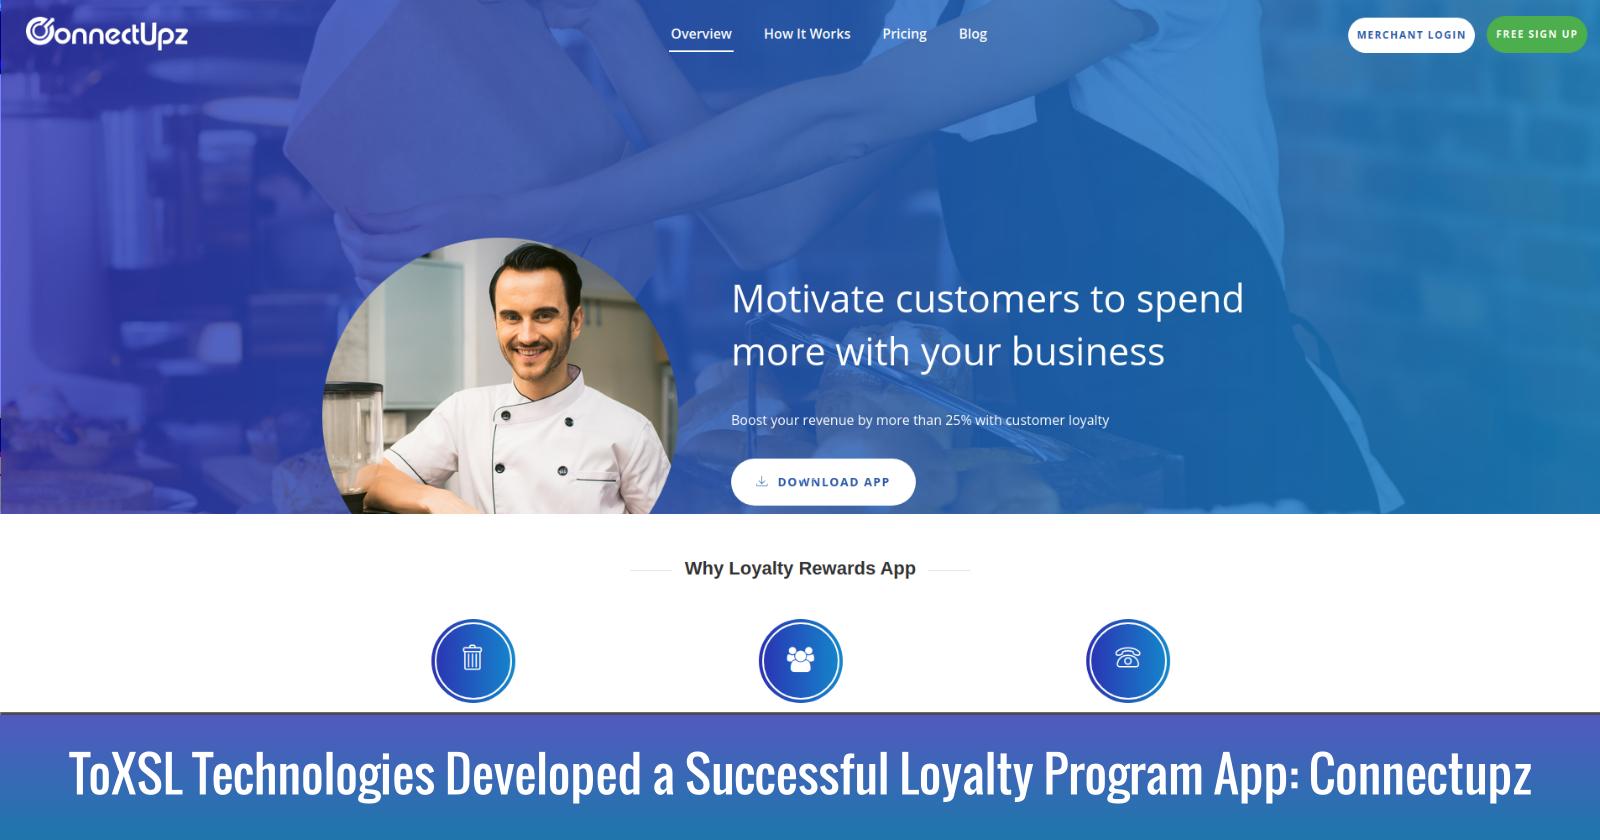 ToXSL Technologies Developed a Successful Loyalty Program App 'Connectupz'